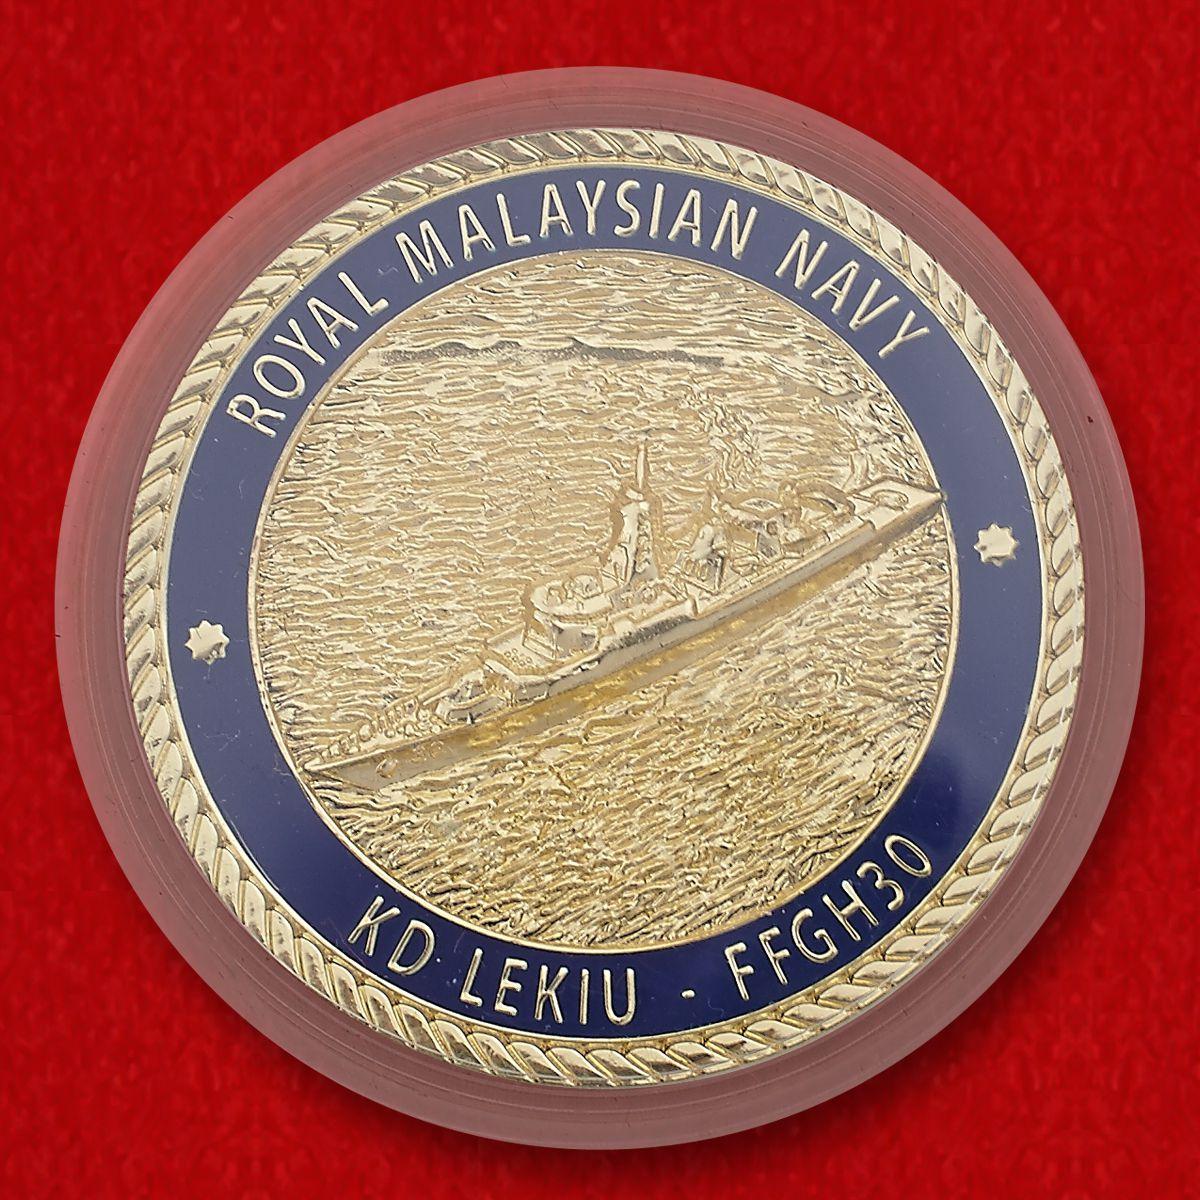 KD Lekiu FFGH30 Royal Malaysian NAVY Challenge Coin